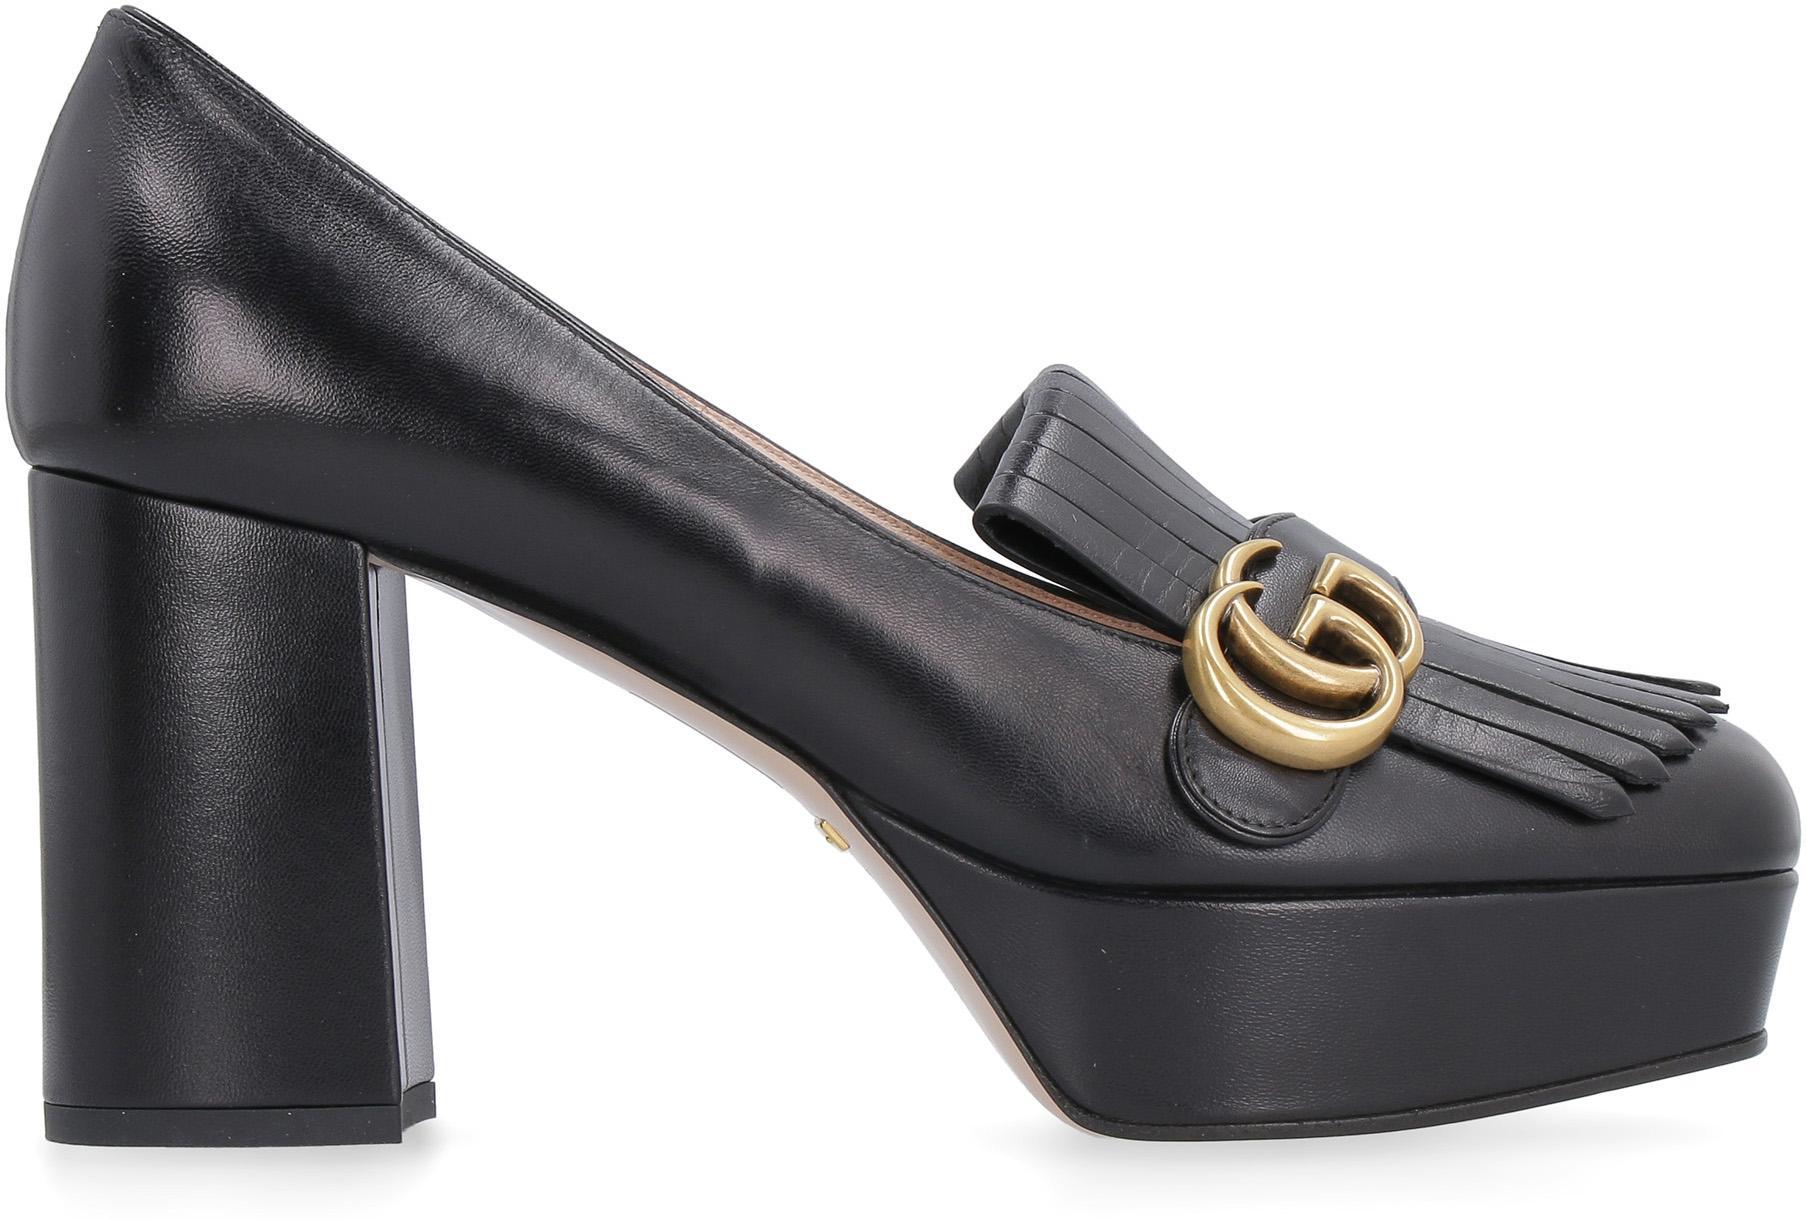 Gucci Leather Houdan 15 Platform Loafer